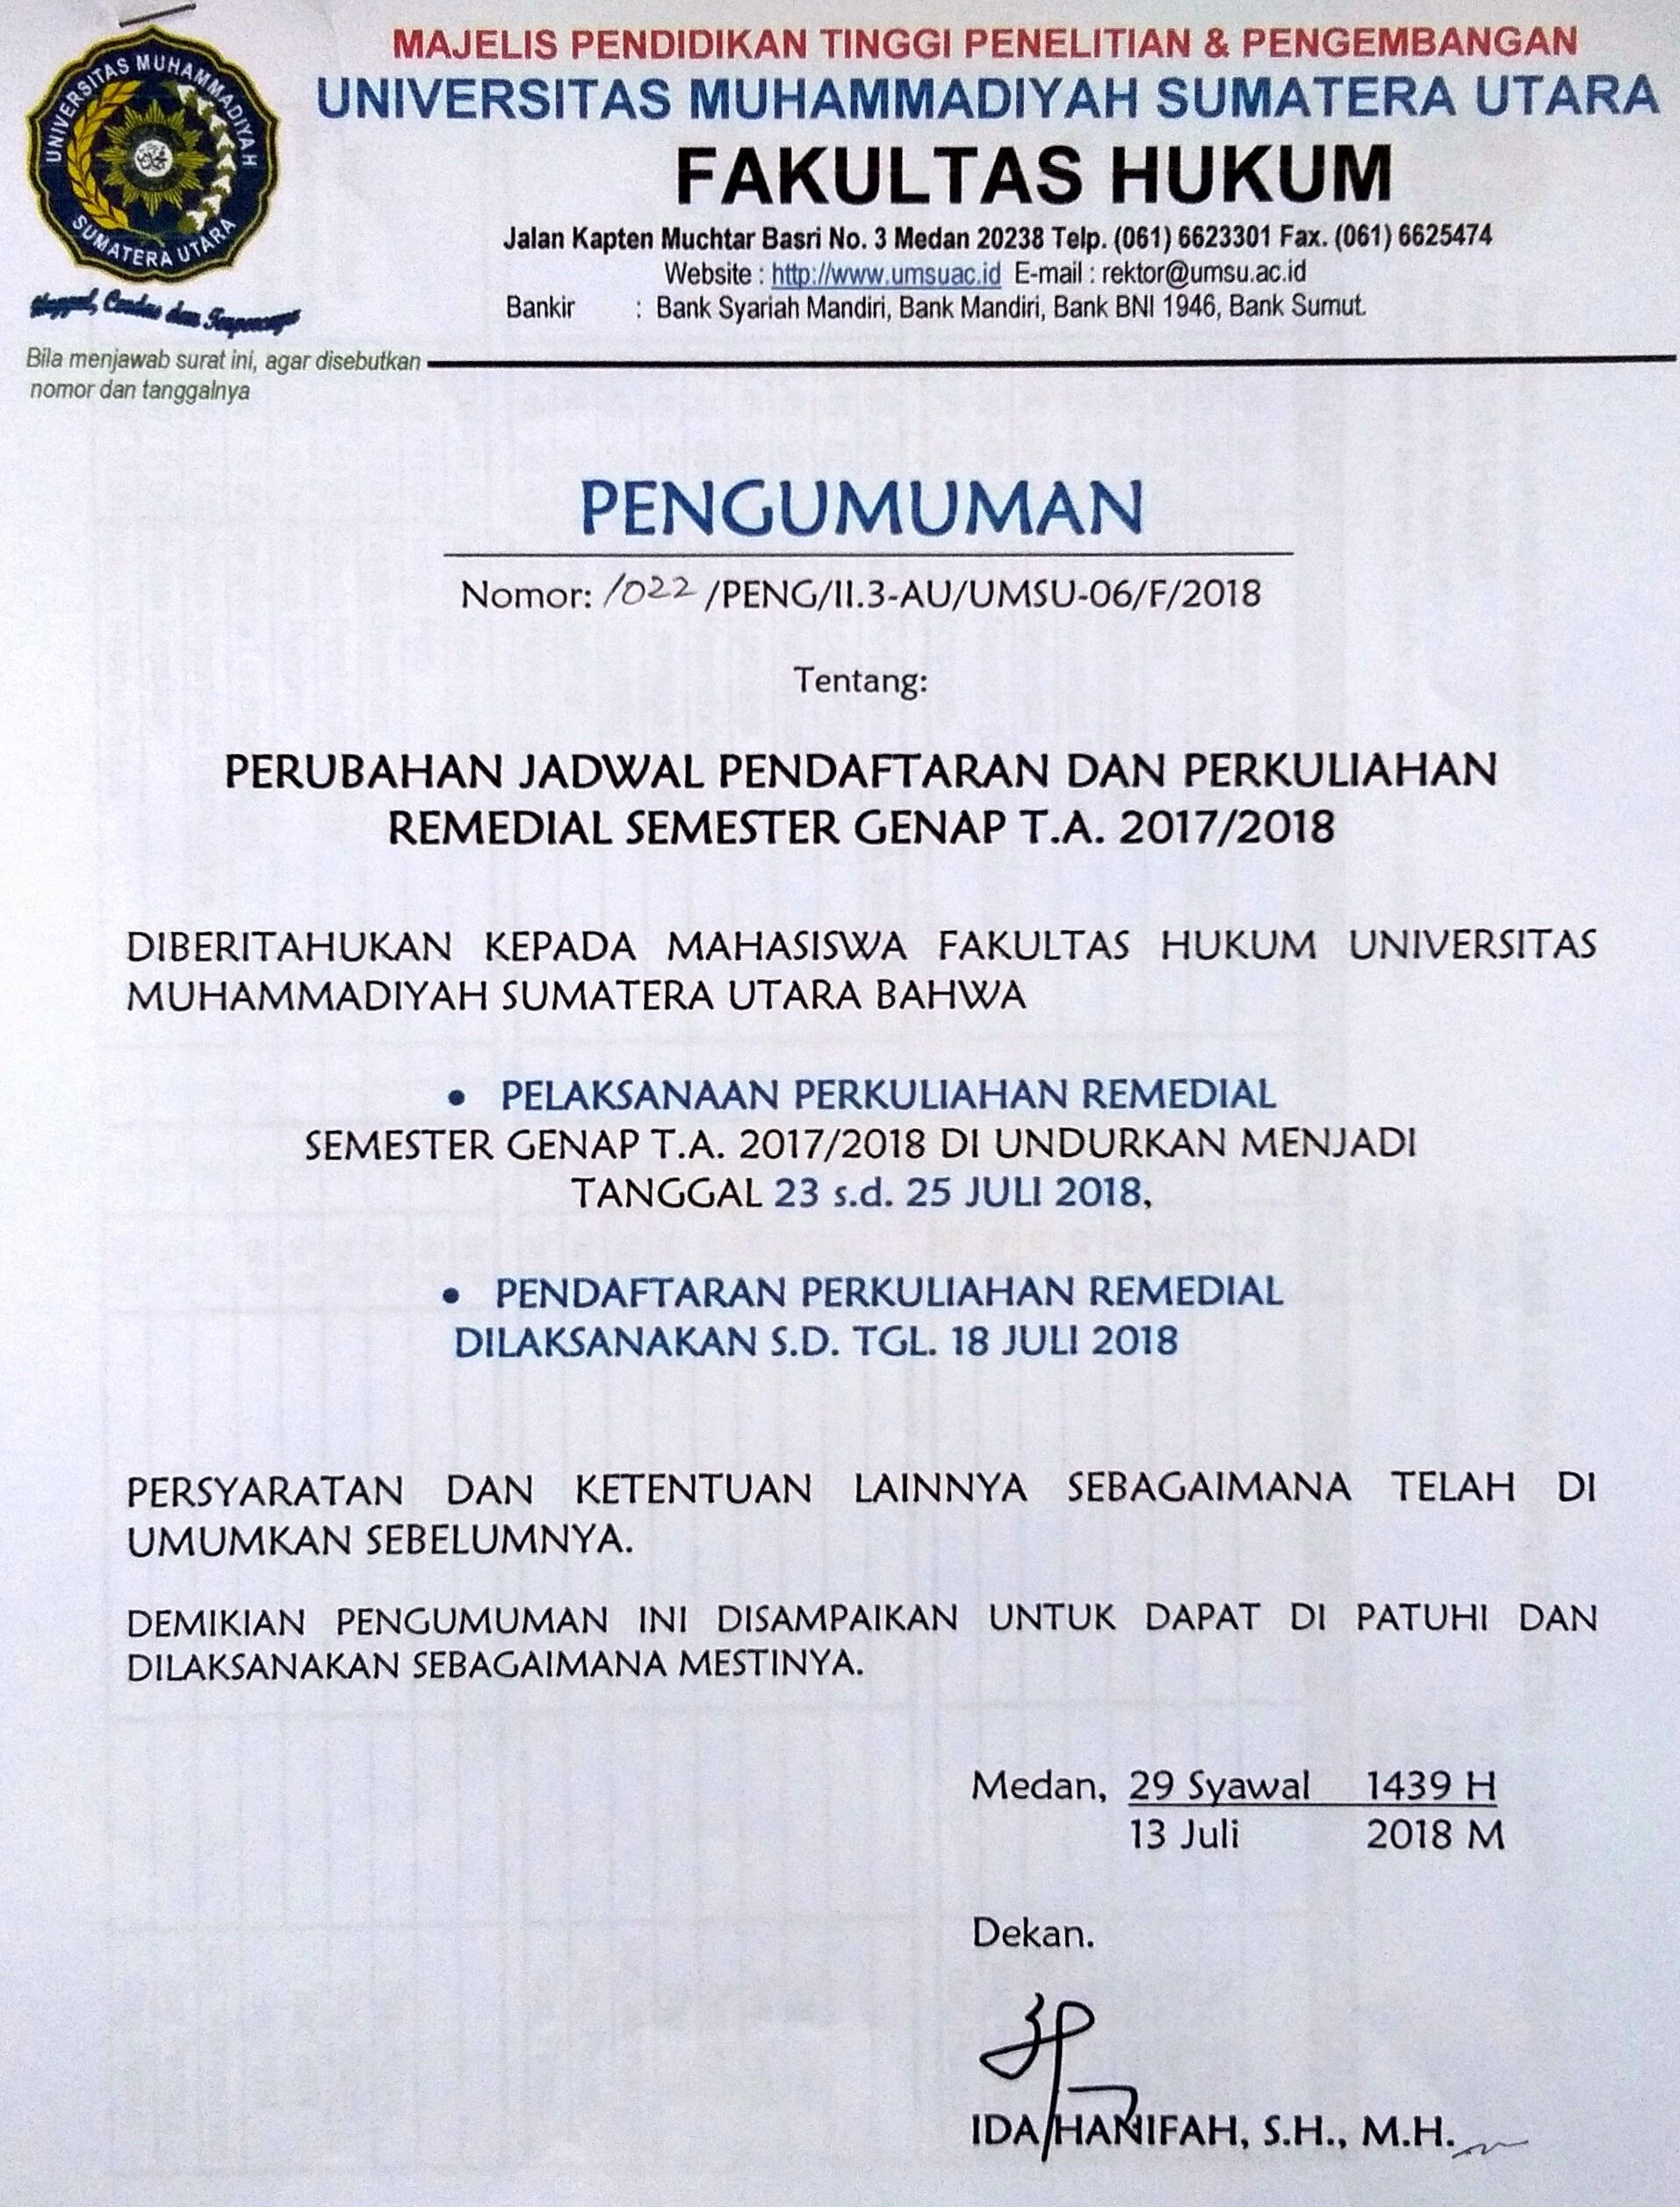 img_20180713_160301